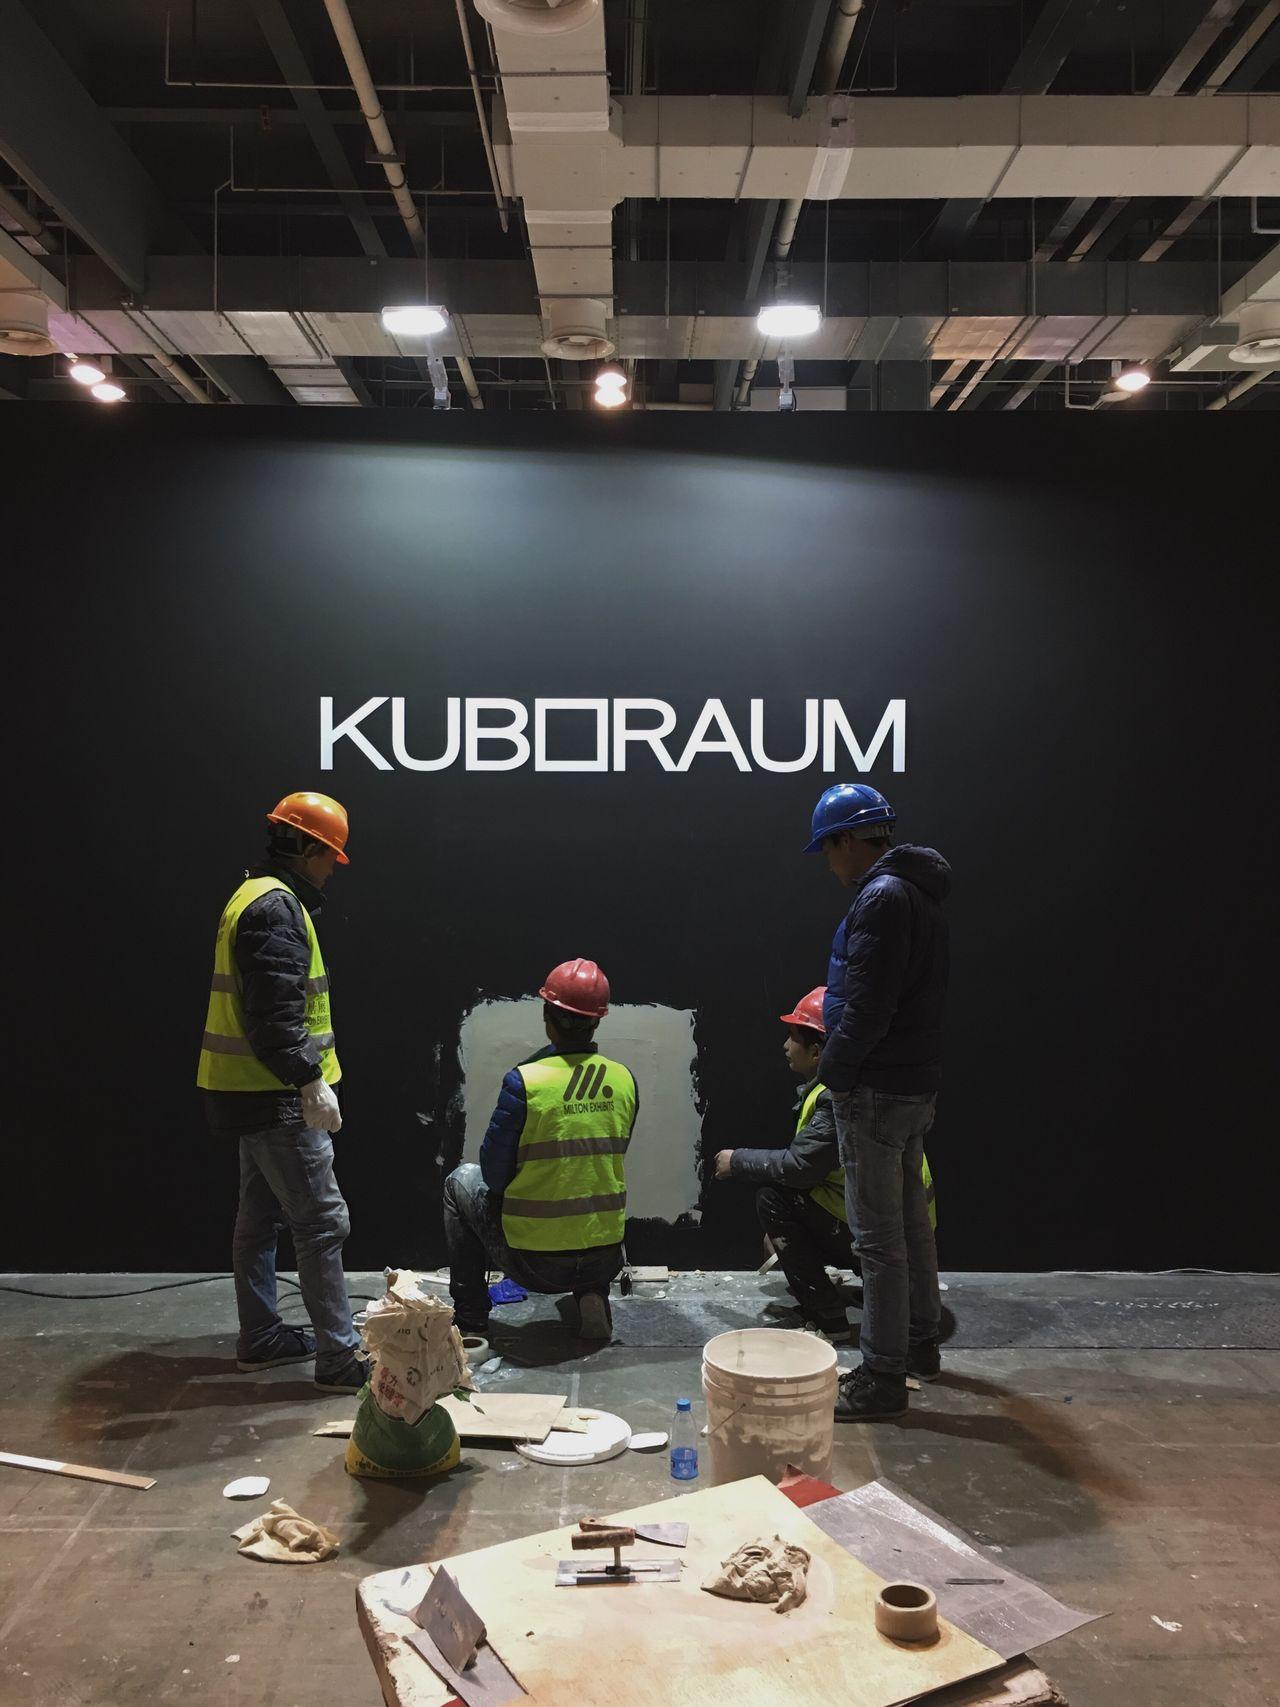 Kuboraum Tradefair Busystranger Workers